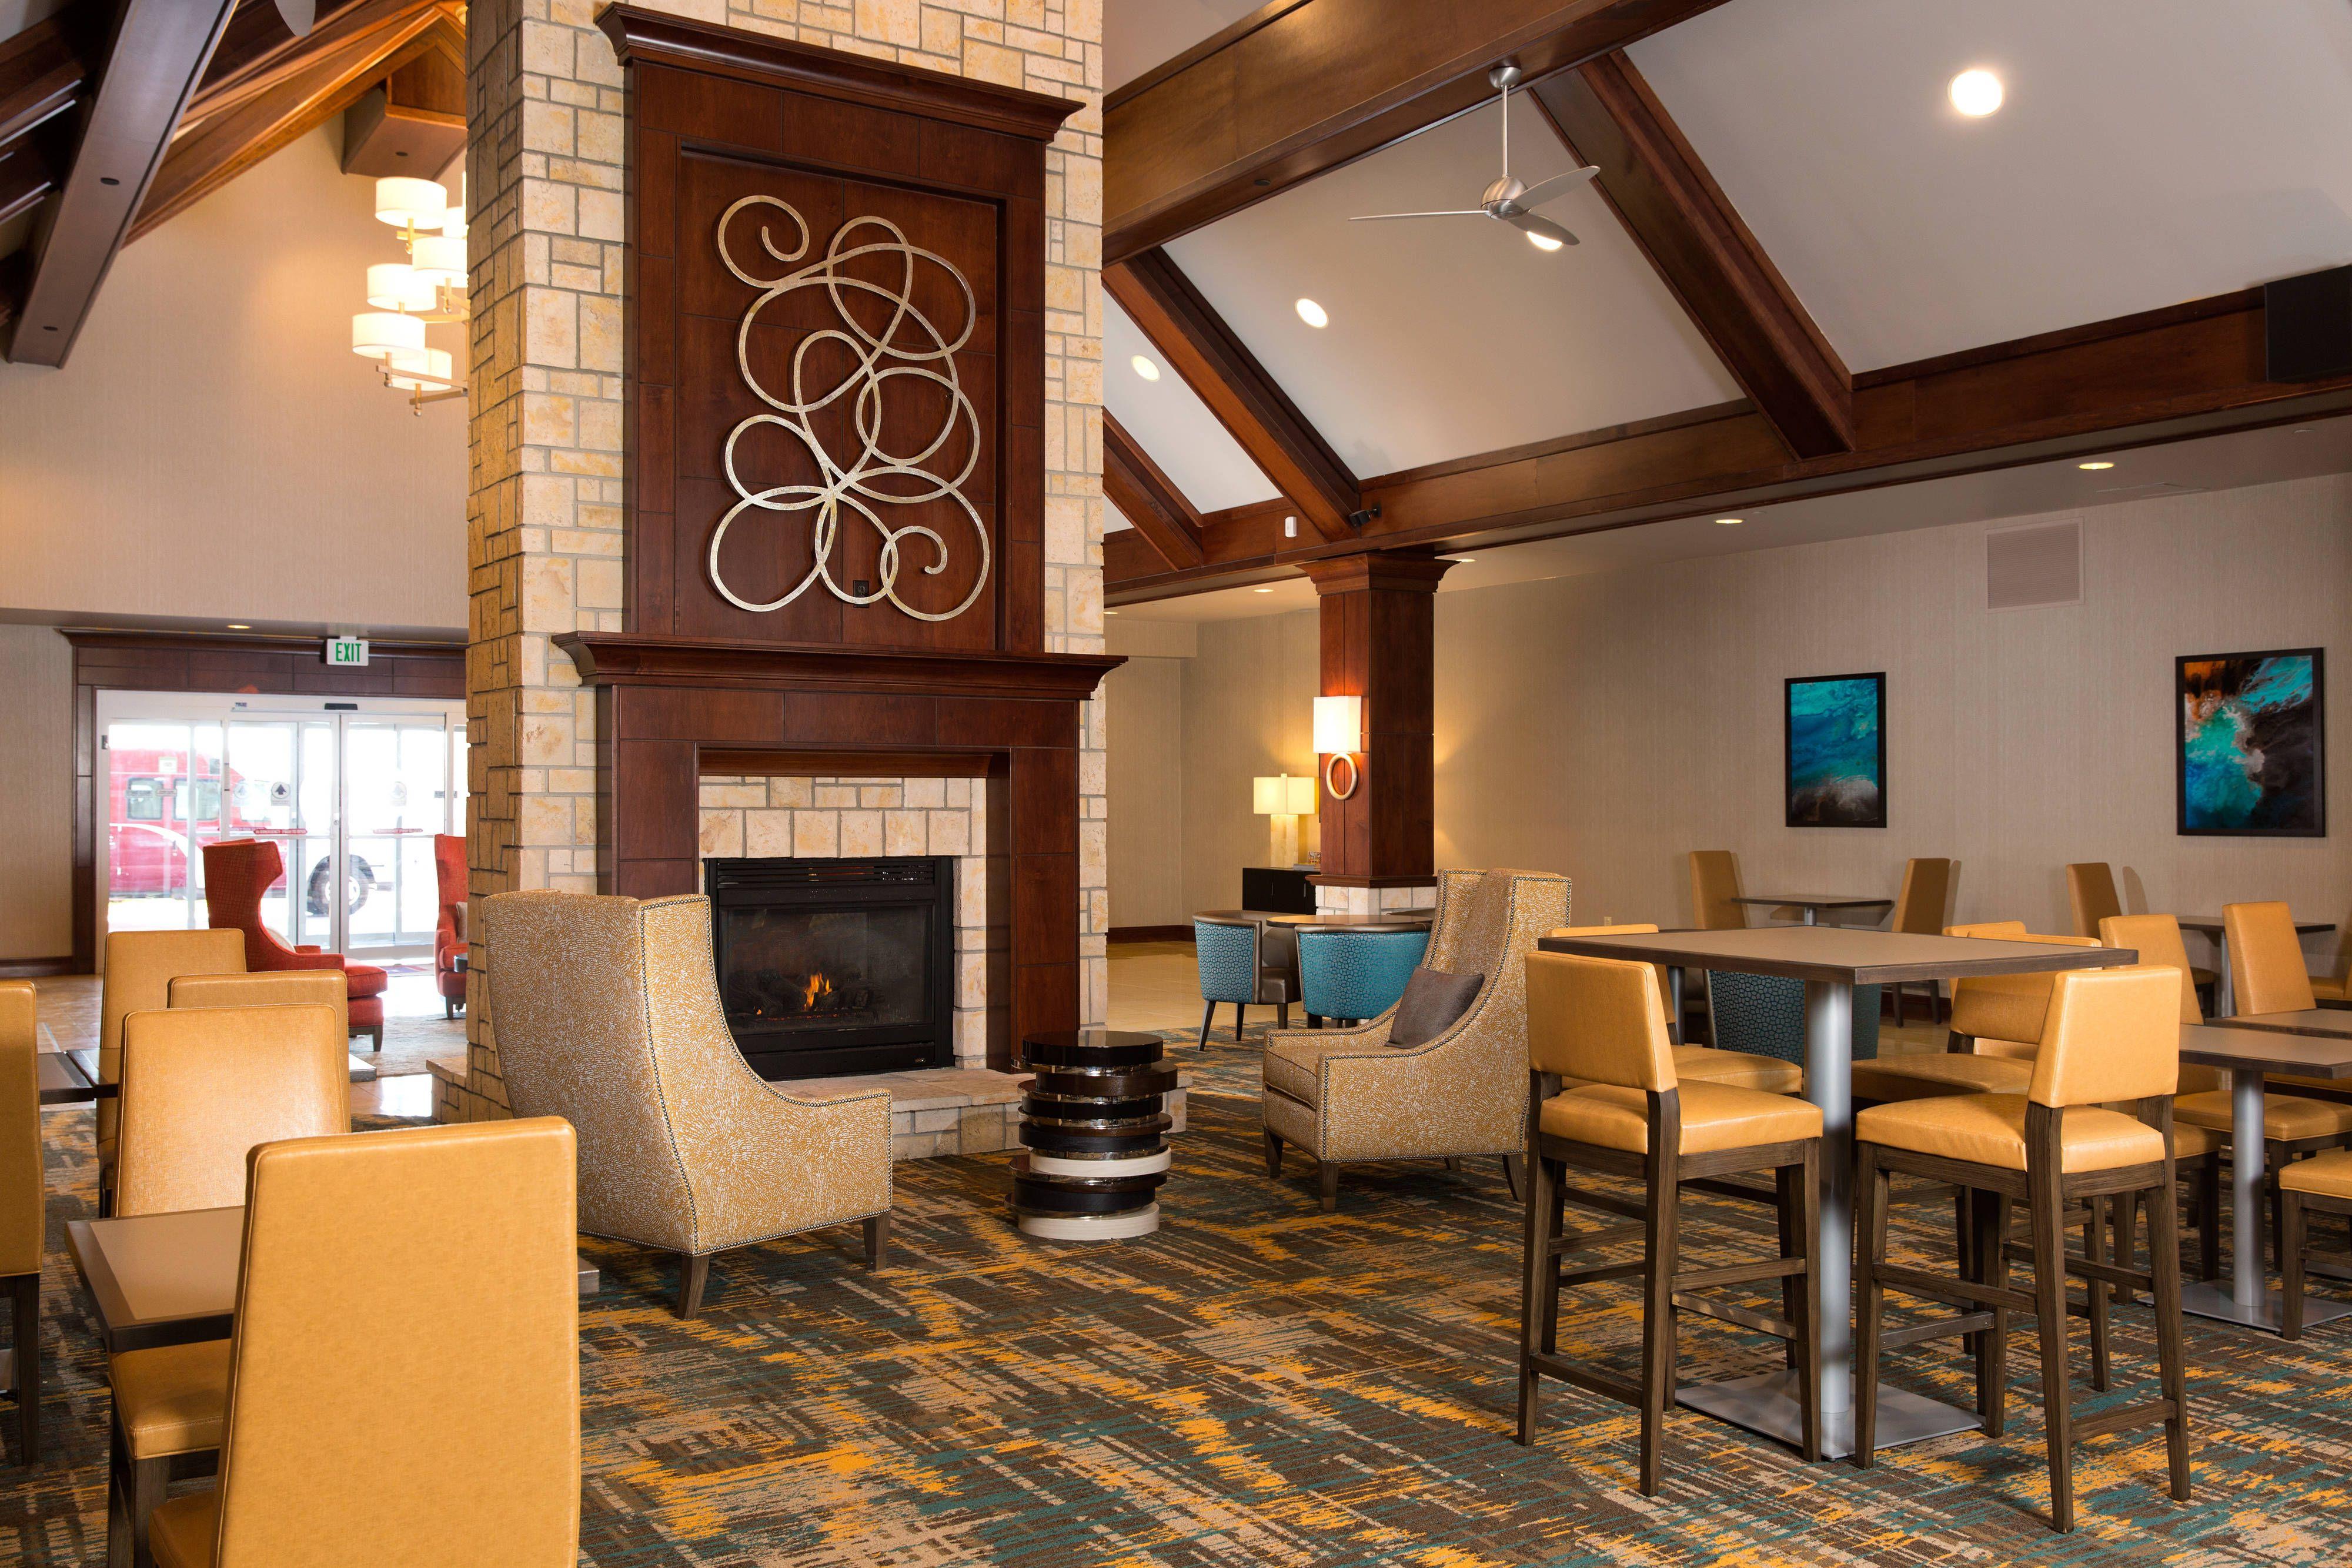 Residence Inn Kansas City Airport Hearth Room Comfort Holiday